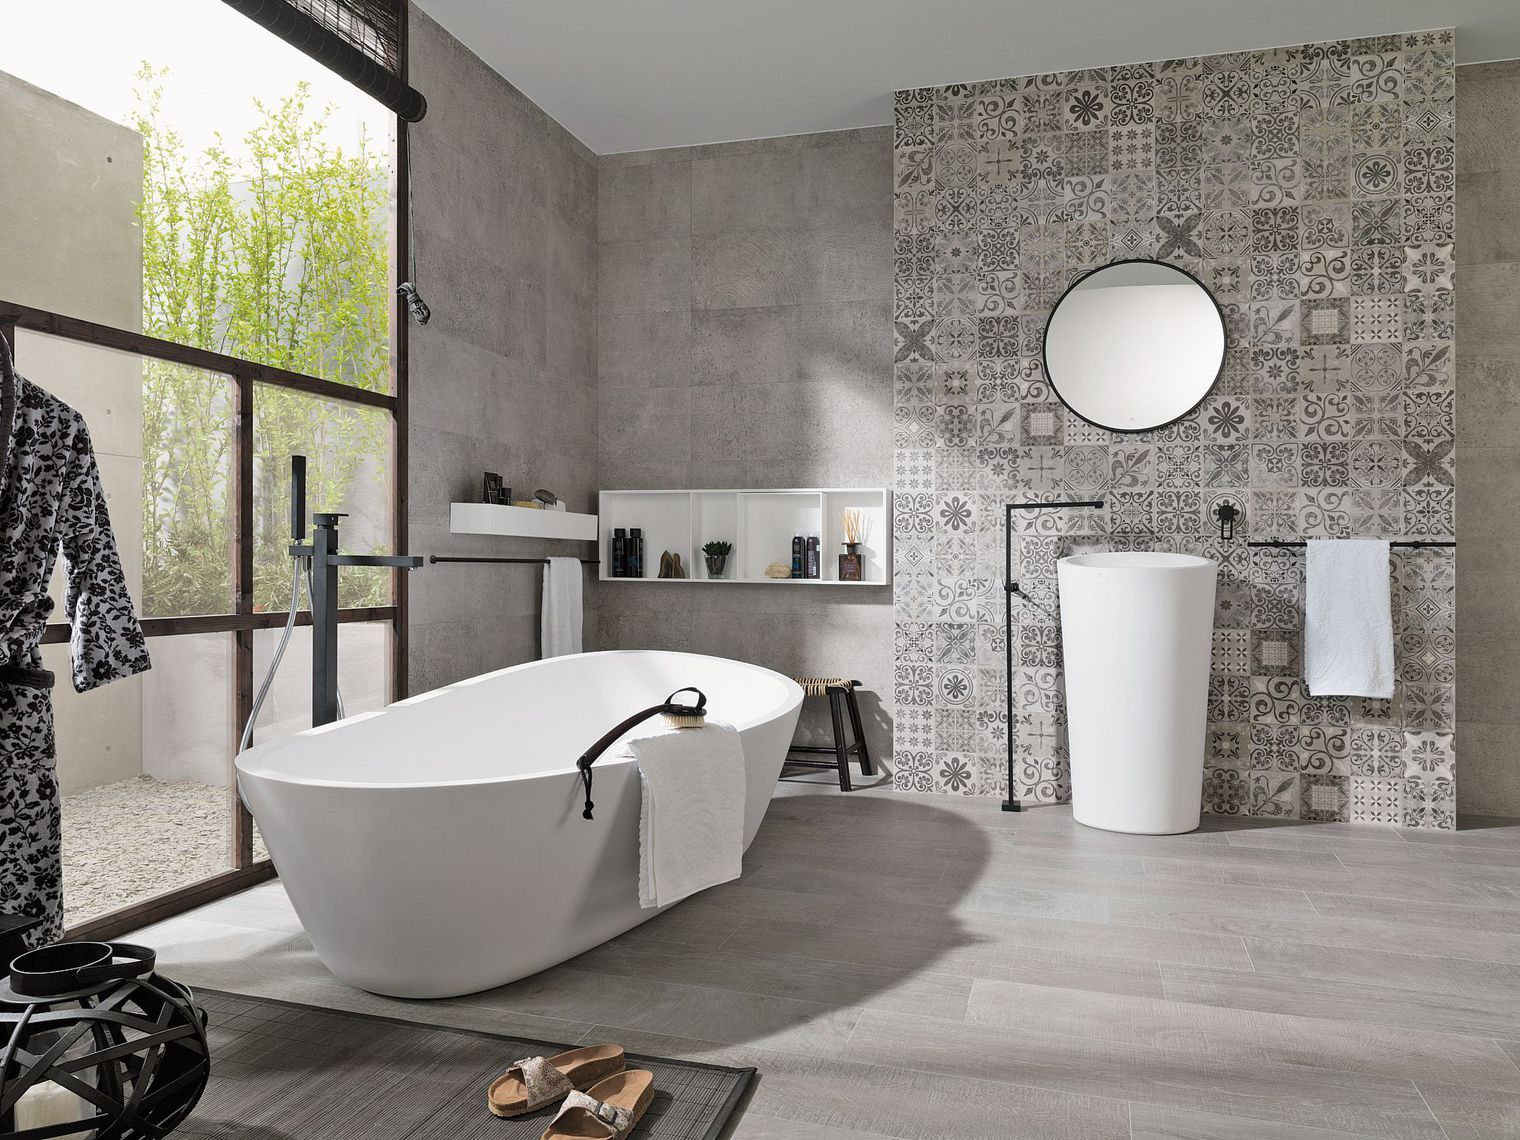 salle bain avec carrelage noir tag vvcom hexagonal motif